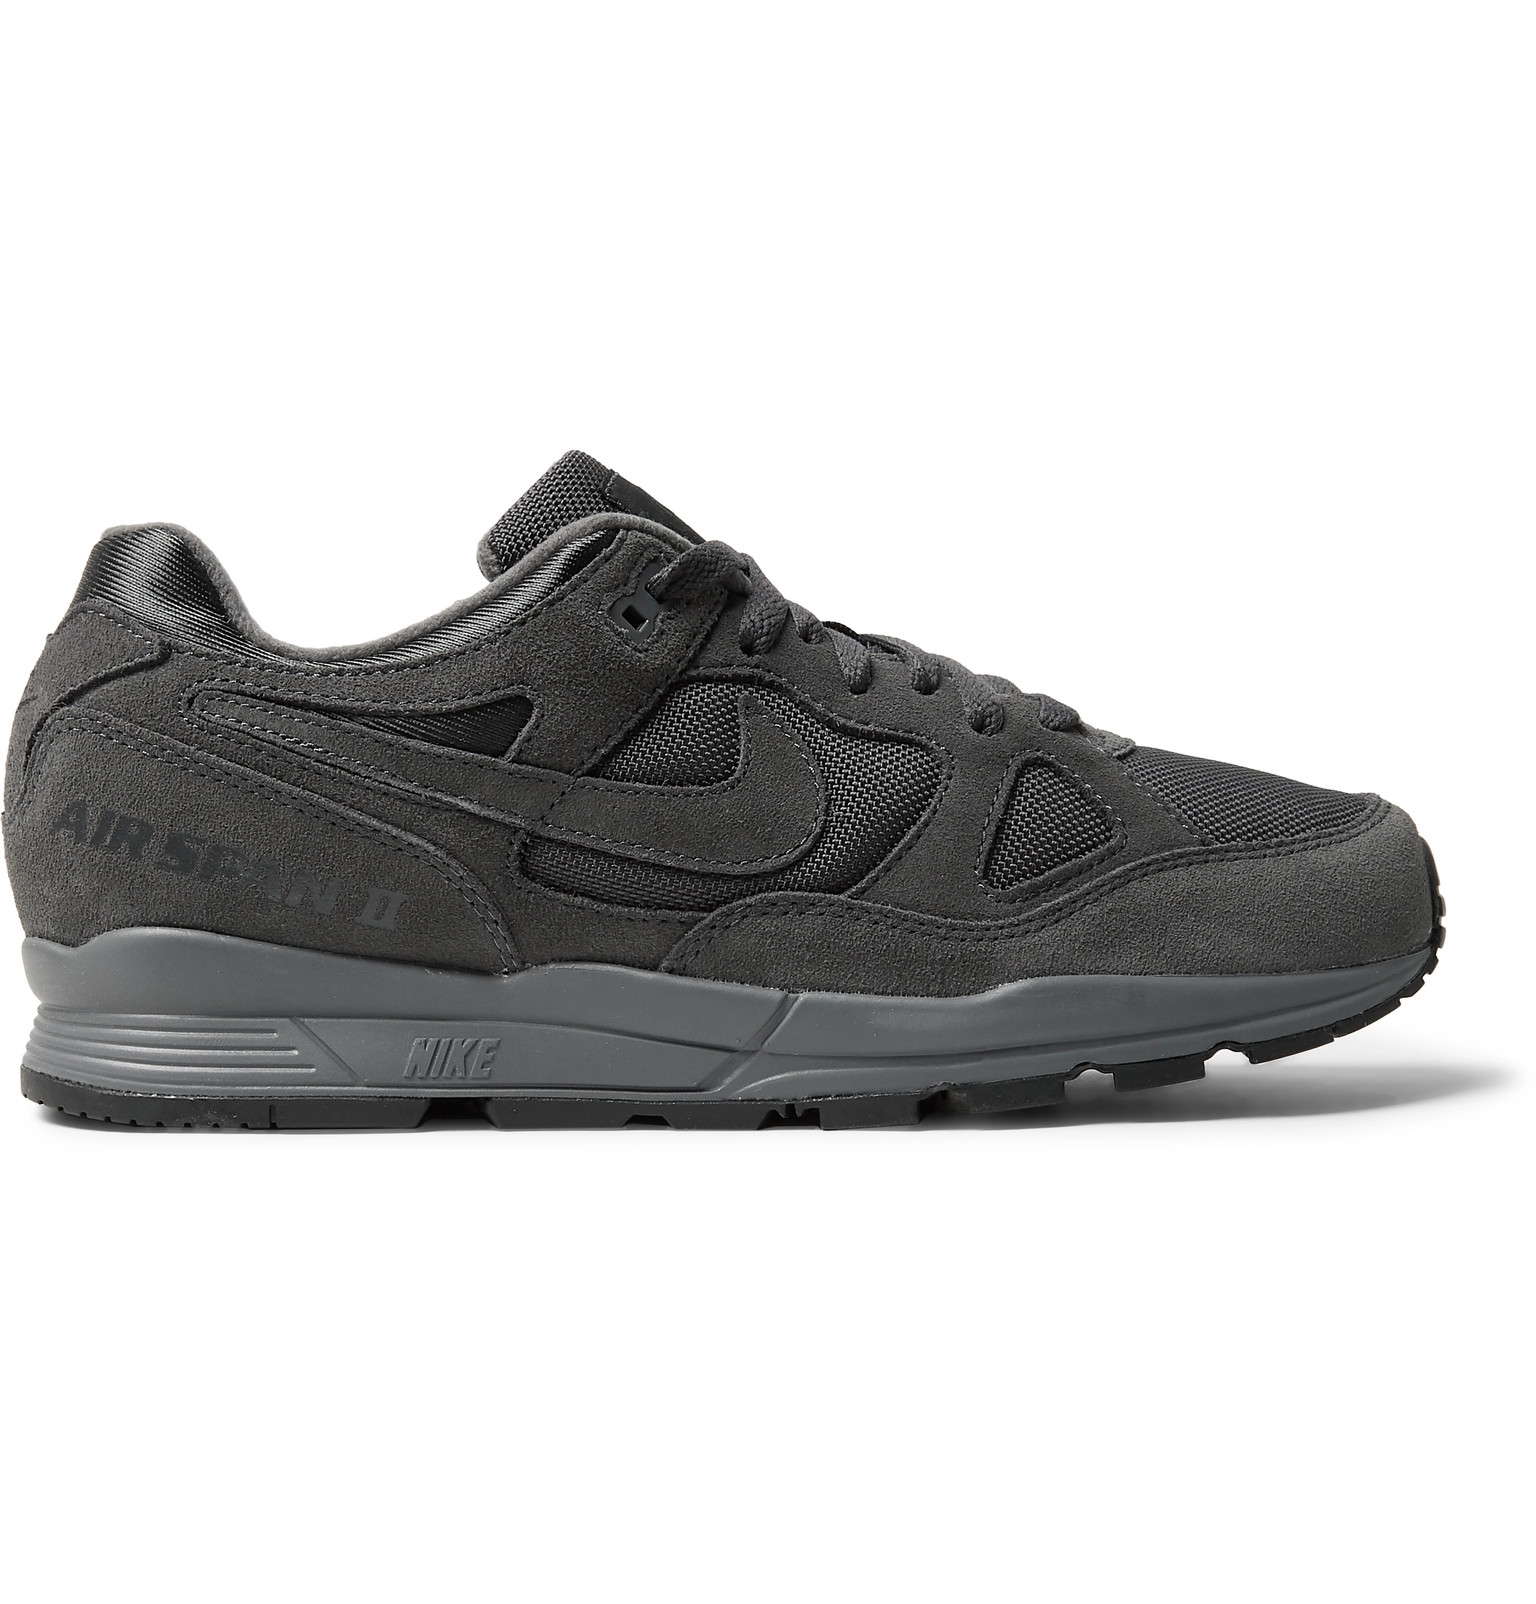 super popular 63d43 beaac Nike - Air Span II Premium Suede-Trimmed Mesh Sneakers